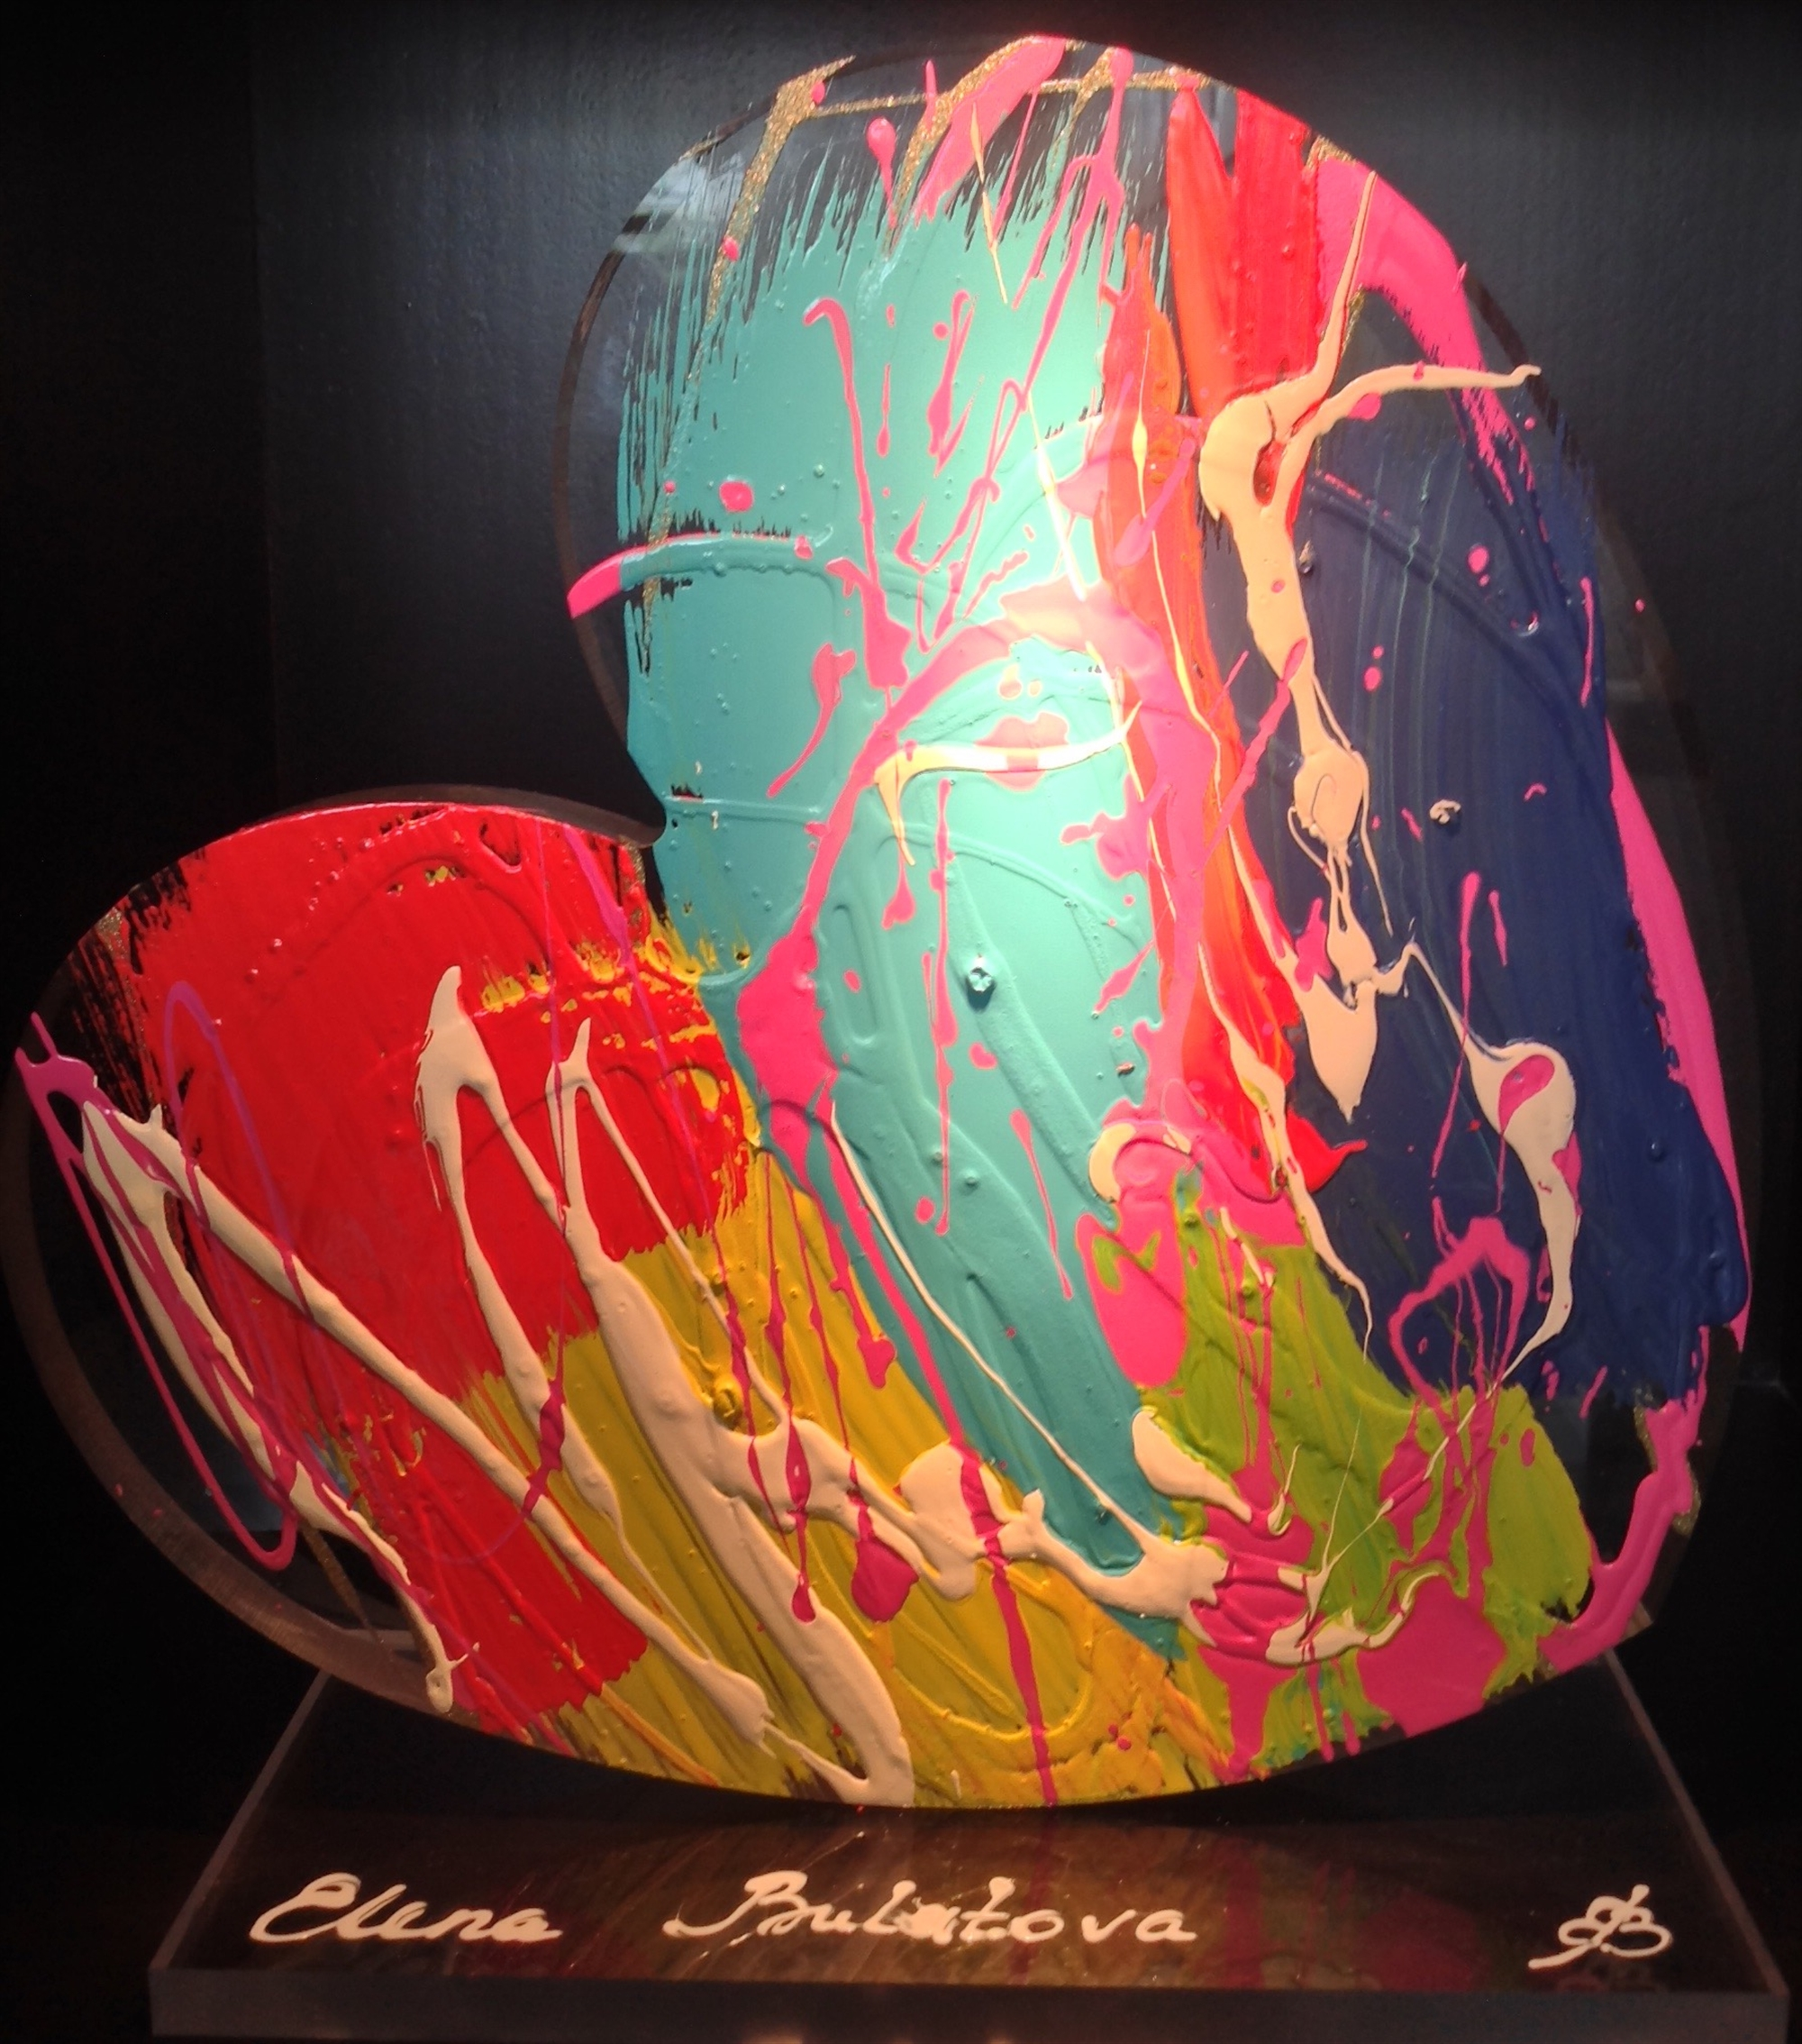 Balancing Heart by Elena Bulatova